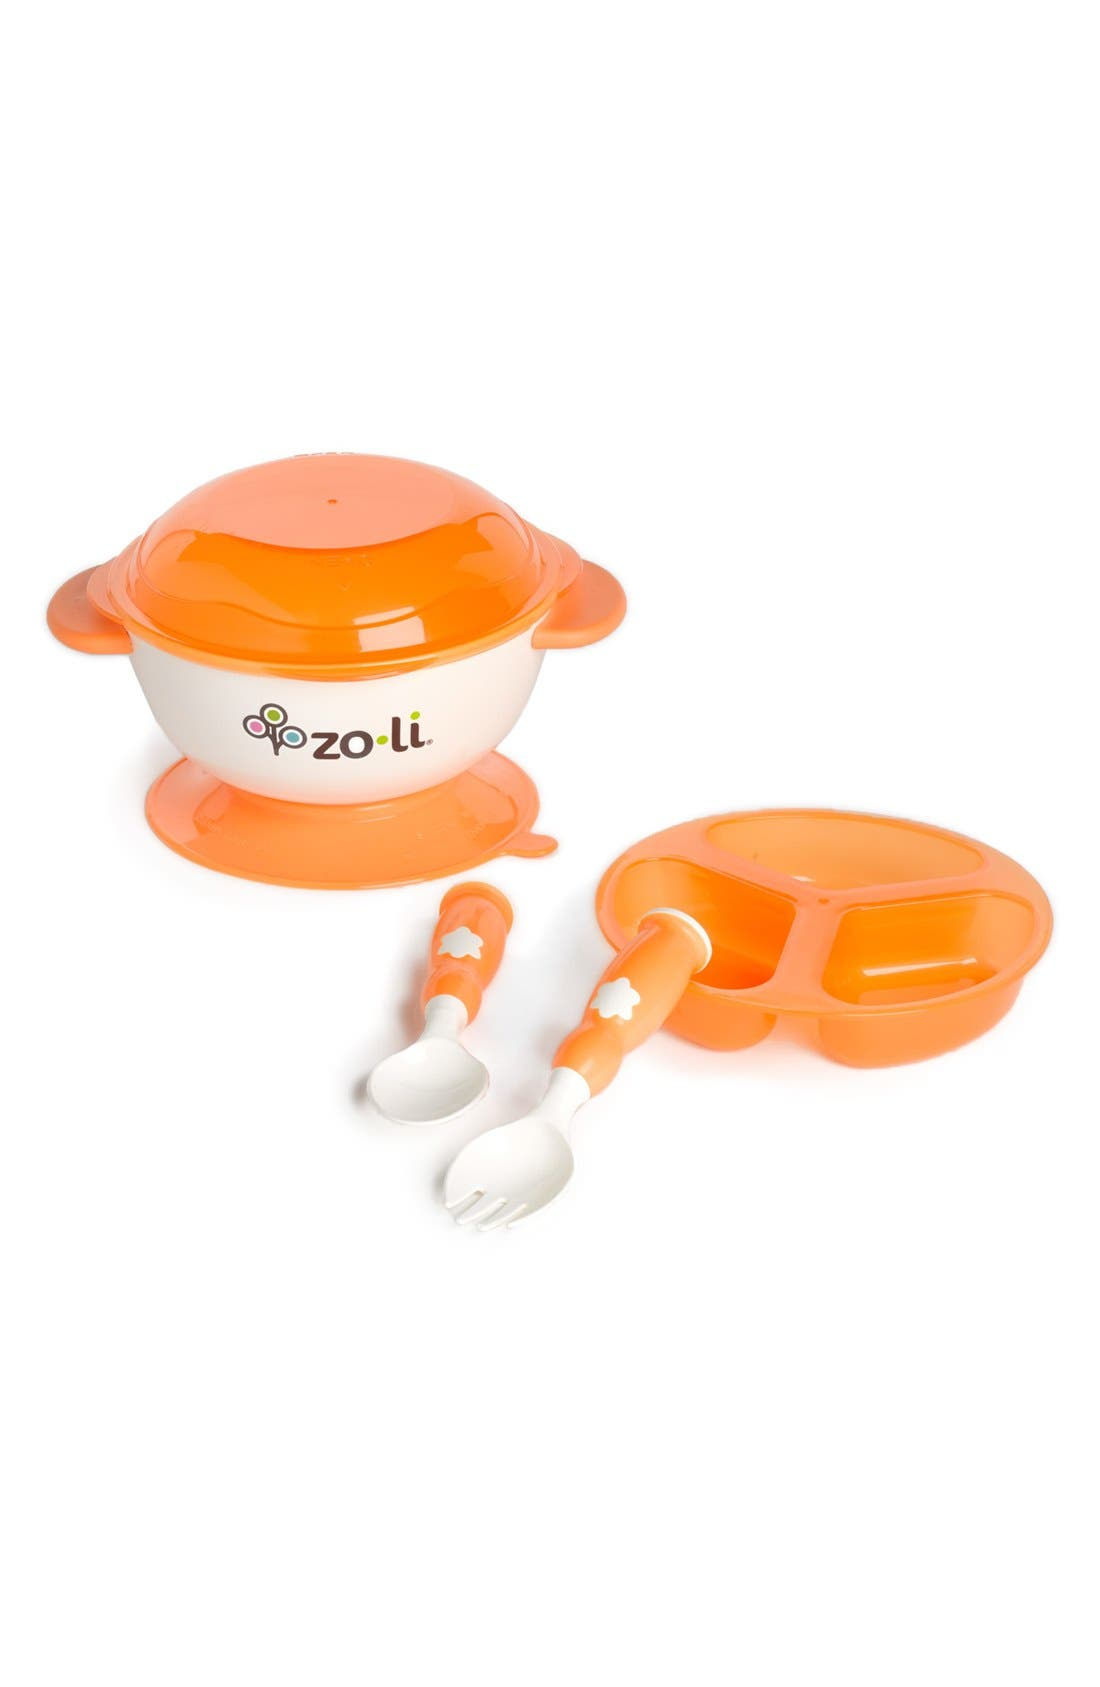 STUCK<sup>™</sup> Suction Bowl Kit,                             Main thumbnail 1, color,                             Orange